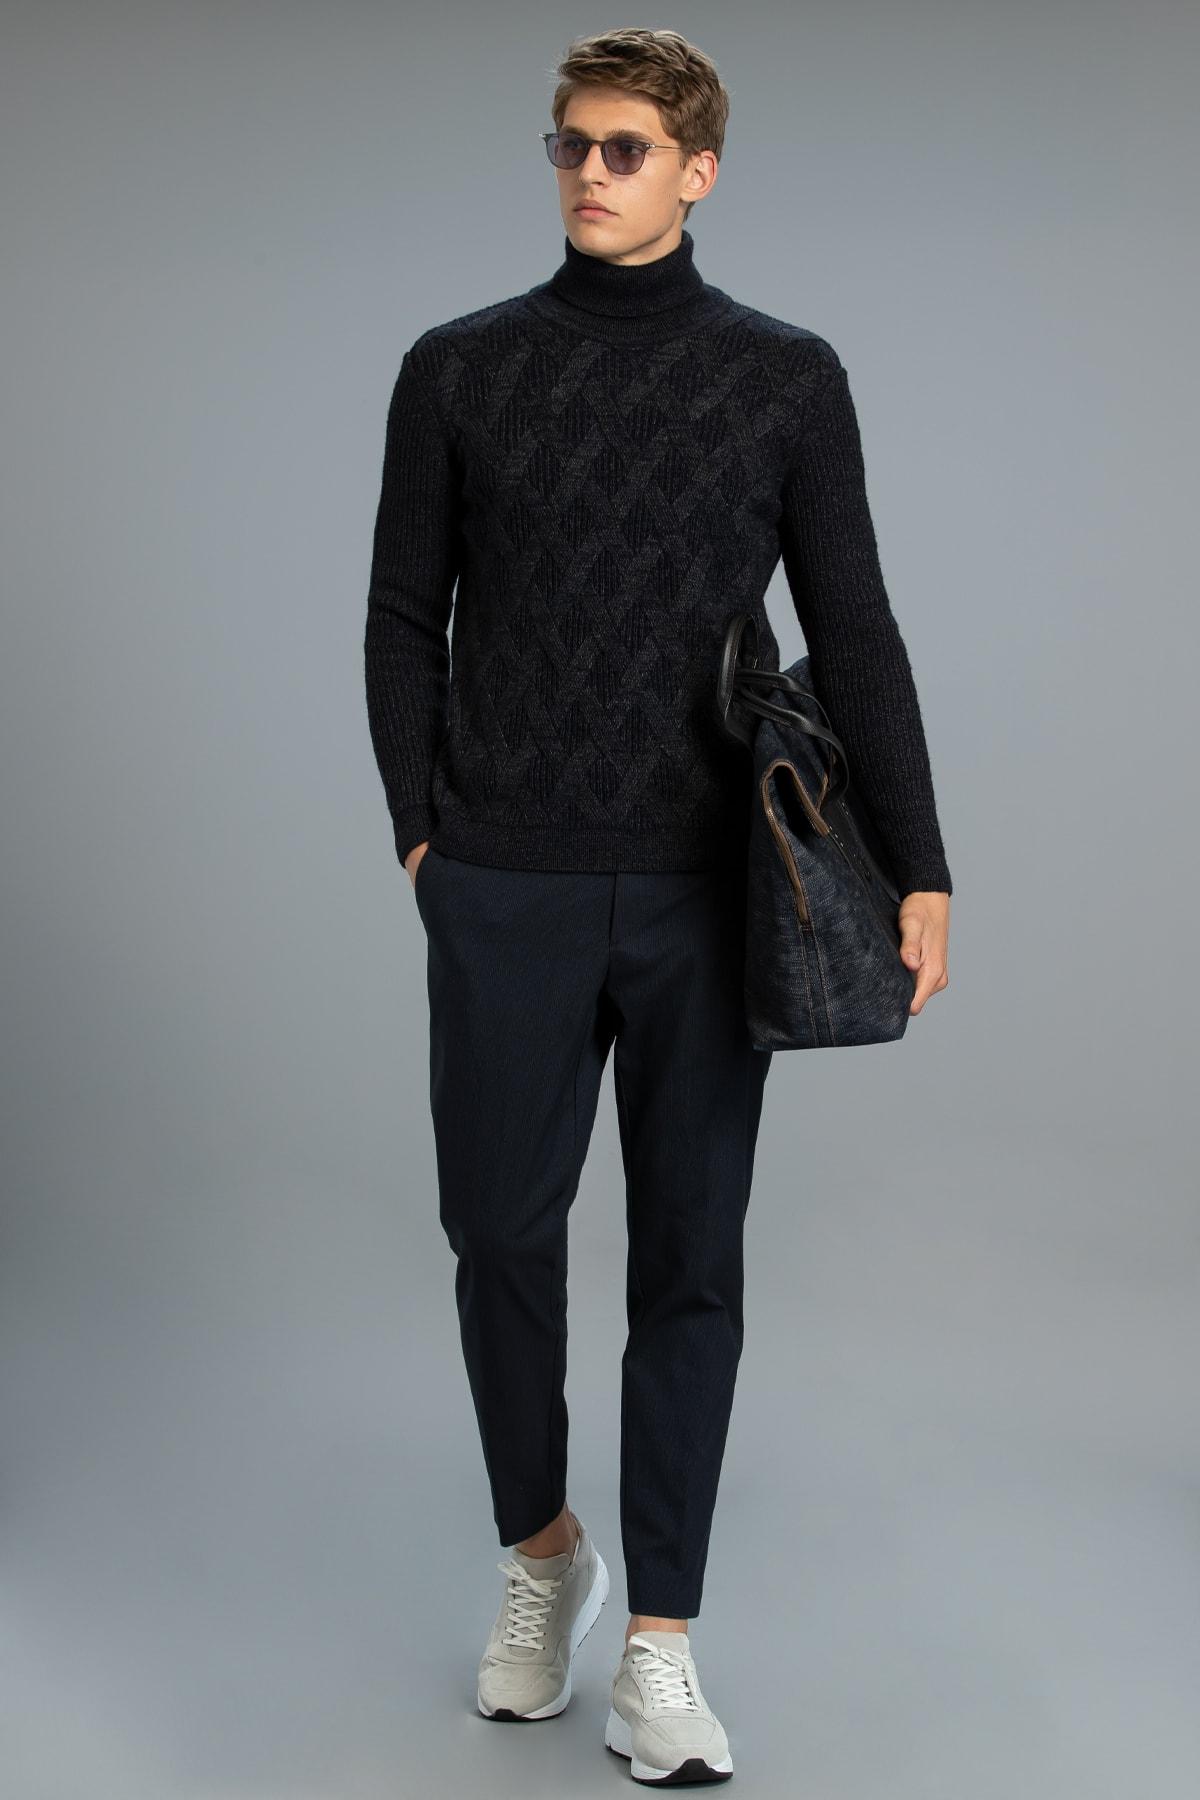 Lufian Tacco Smart Chino Pantolon Slim Fit Lacivert